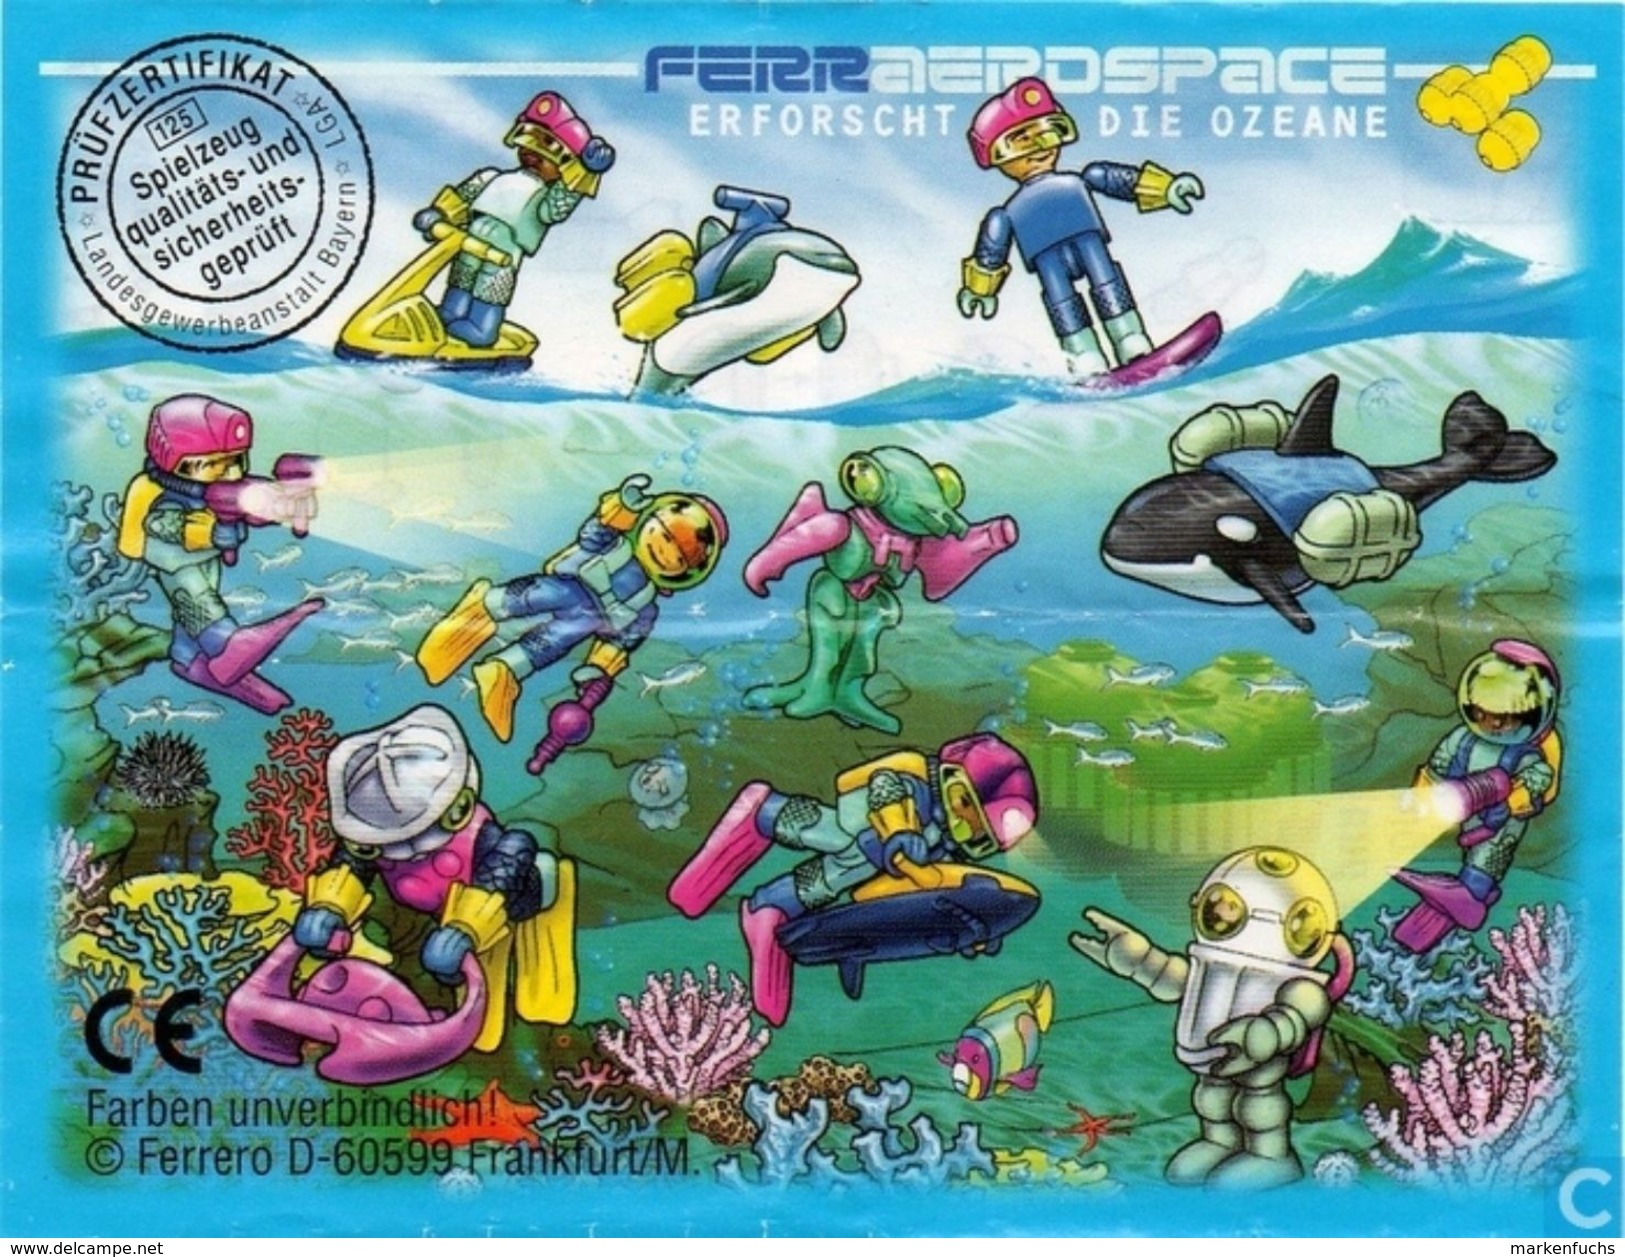 Ferraerospace Ozean 1998 / Schwertwal + BPZ - Maxi (Kinder-)